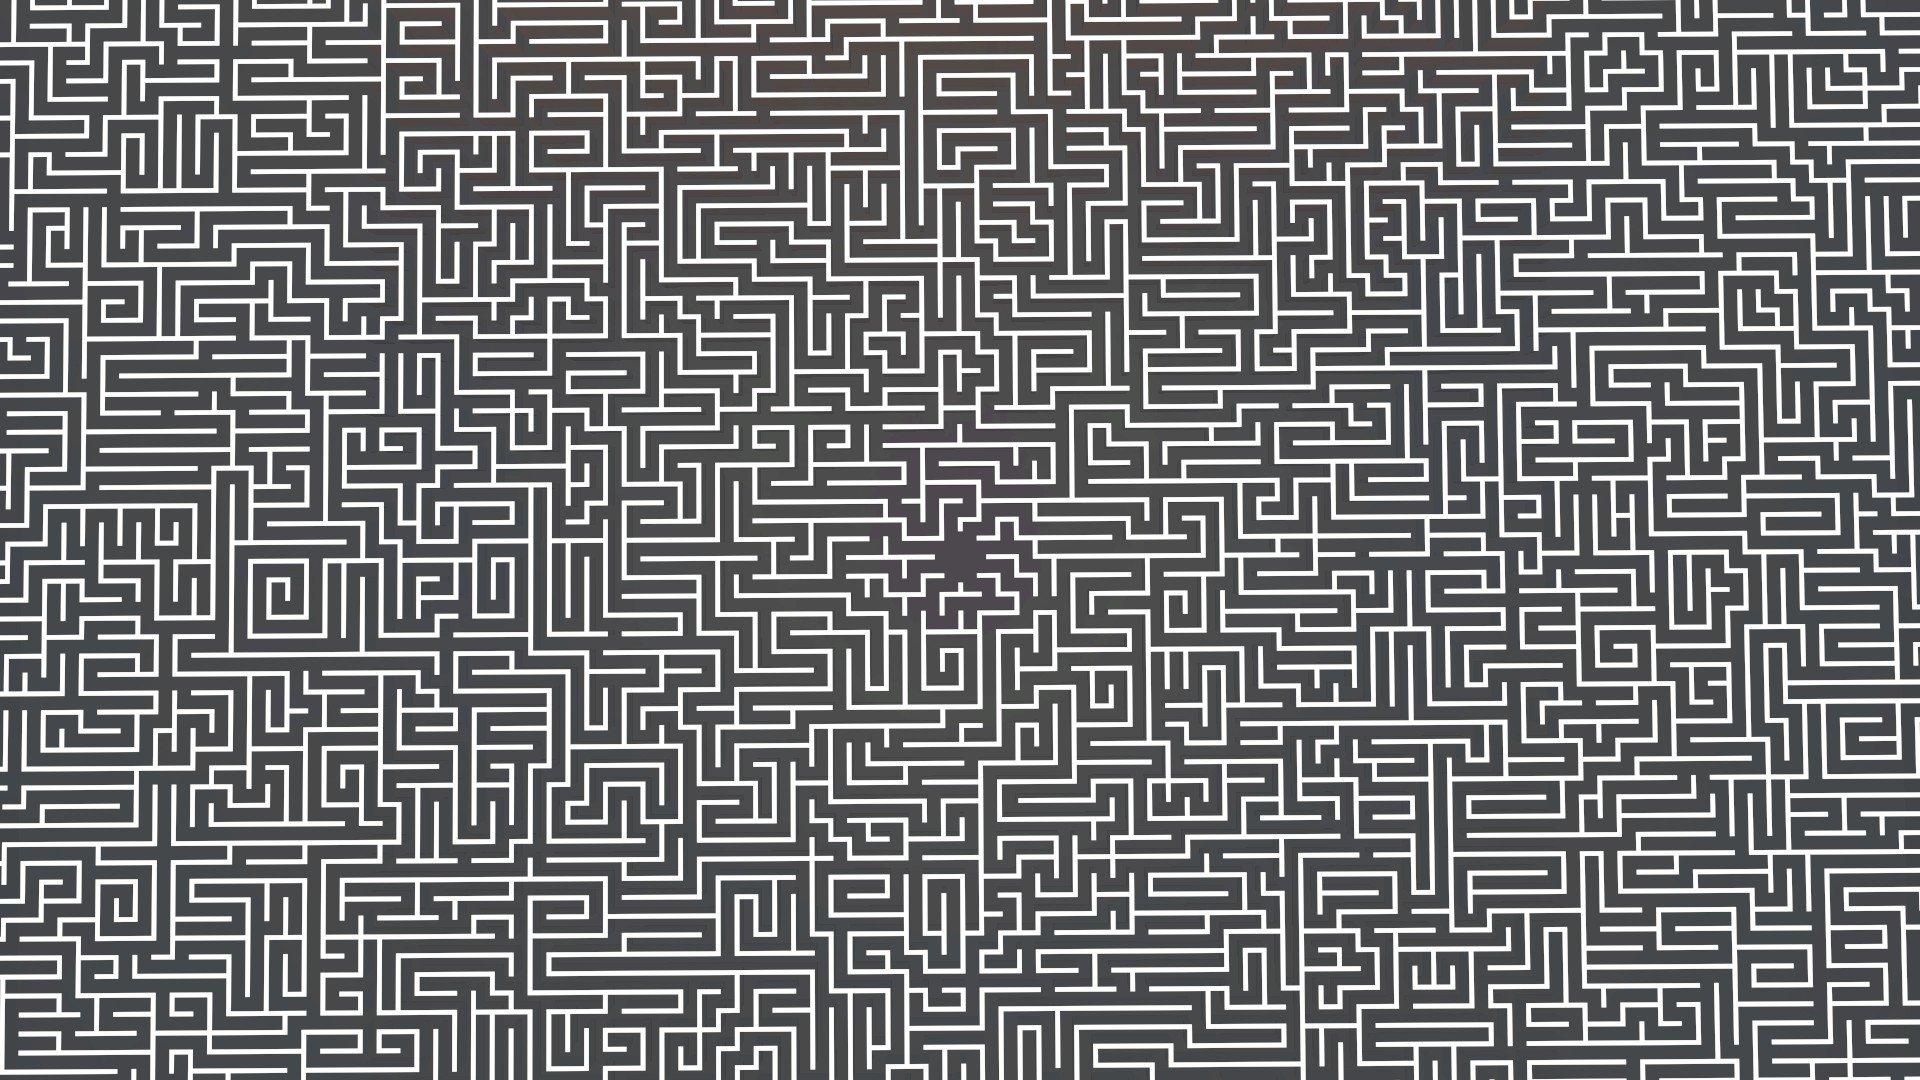 Labyrinth Wallpaper Free